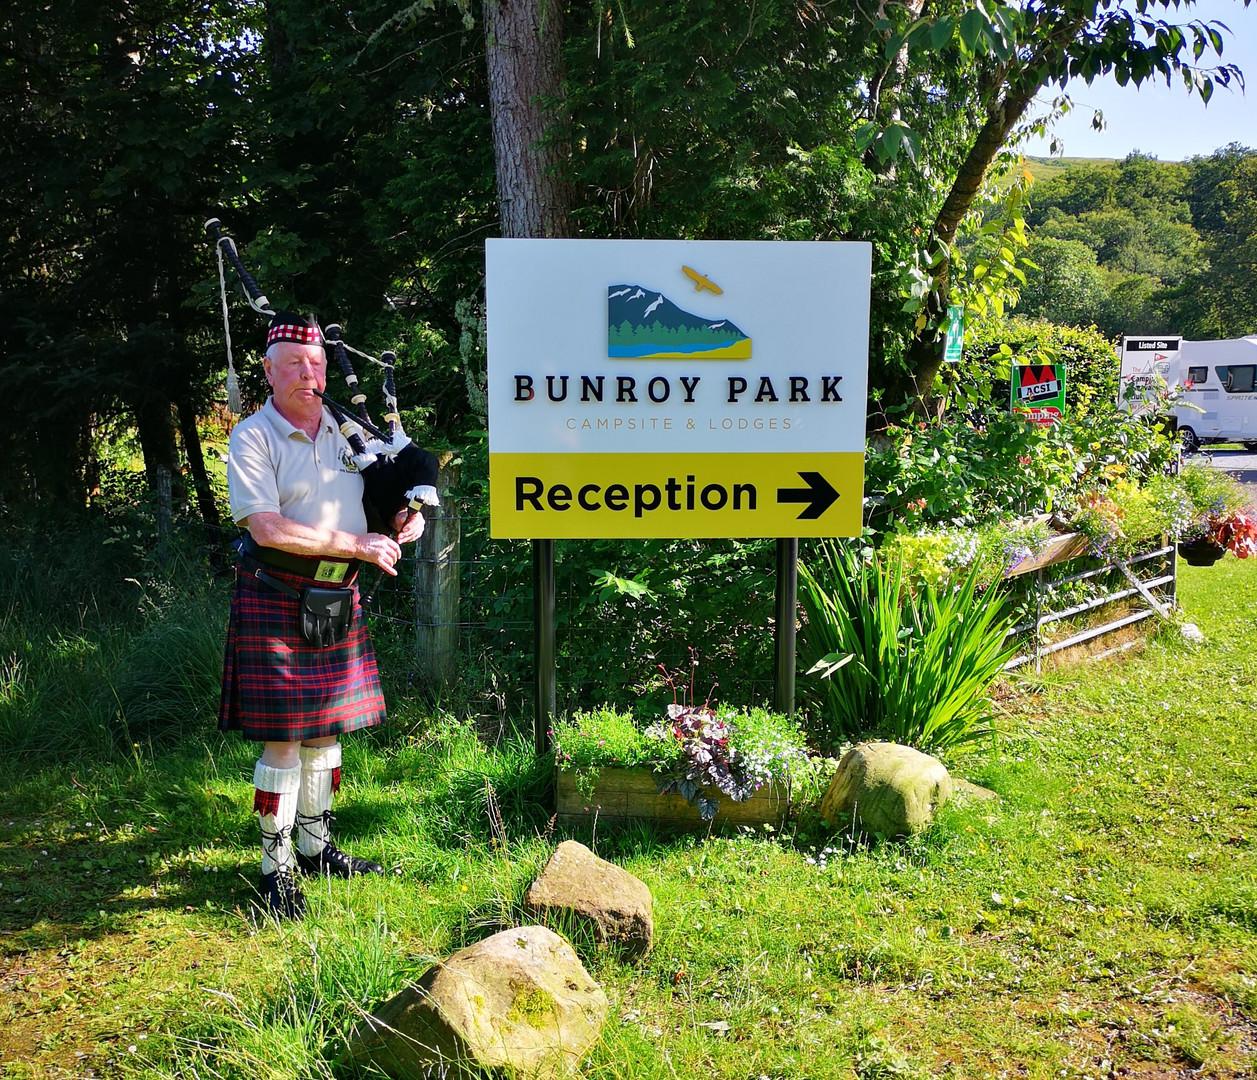 Bunroy Park